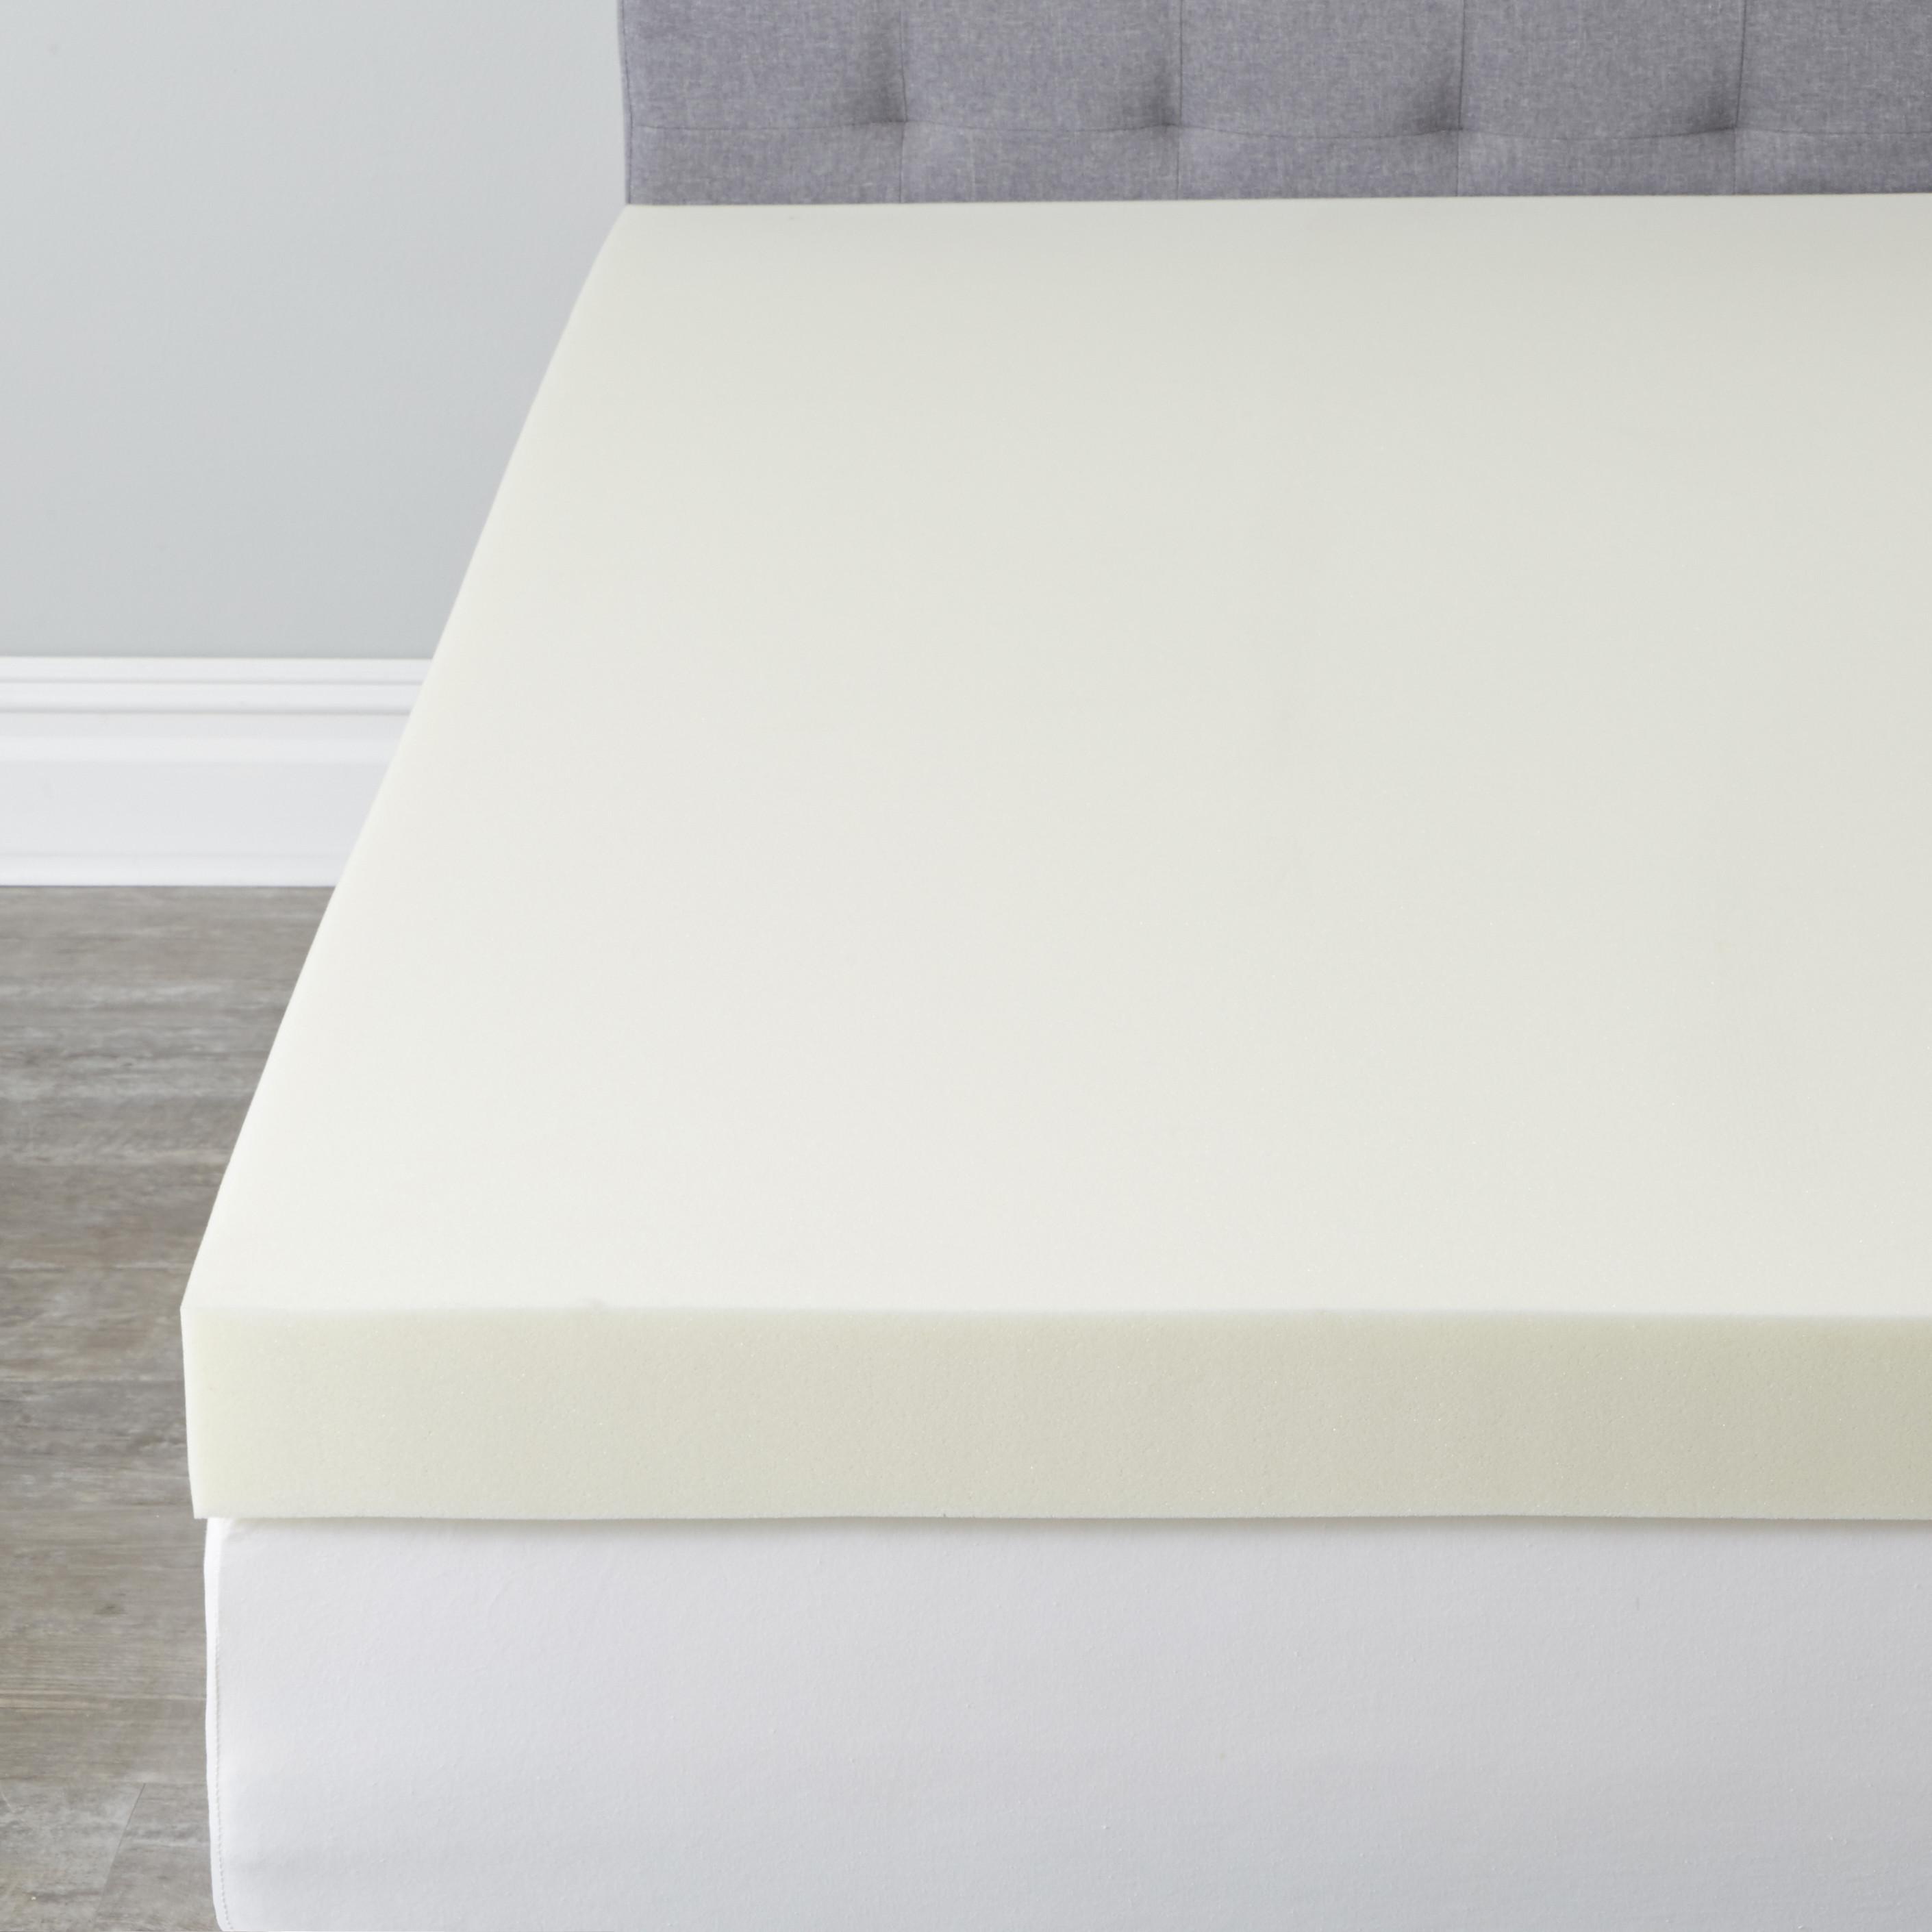 4 Thick Visco Elastic Memory Foam Mattress Topper Plus Size